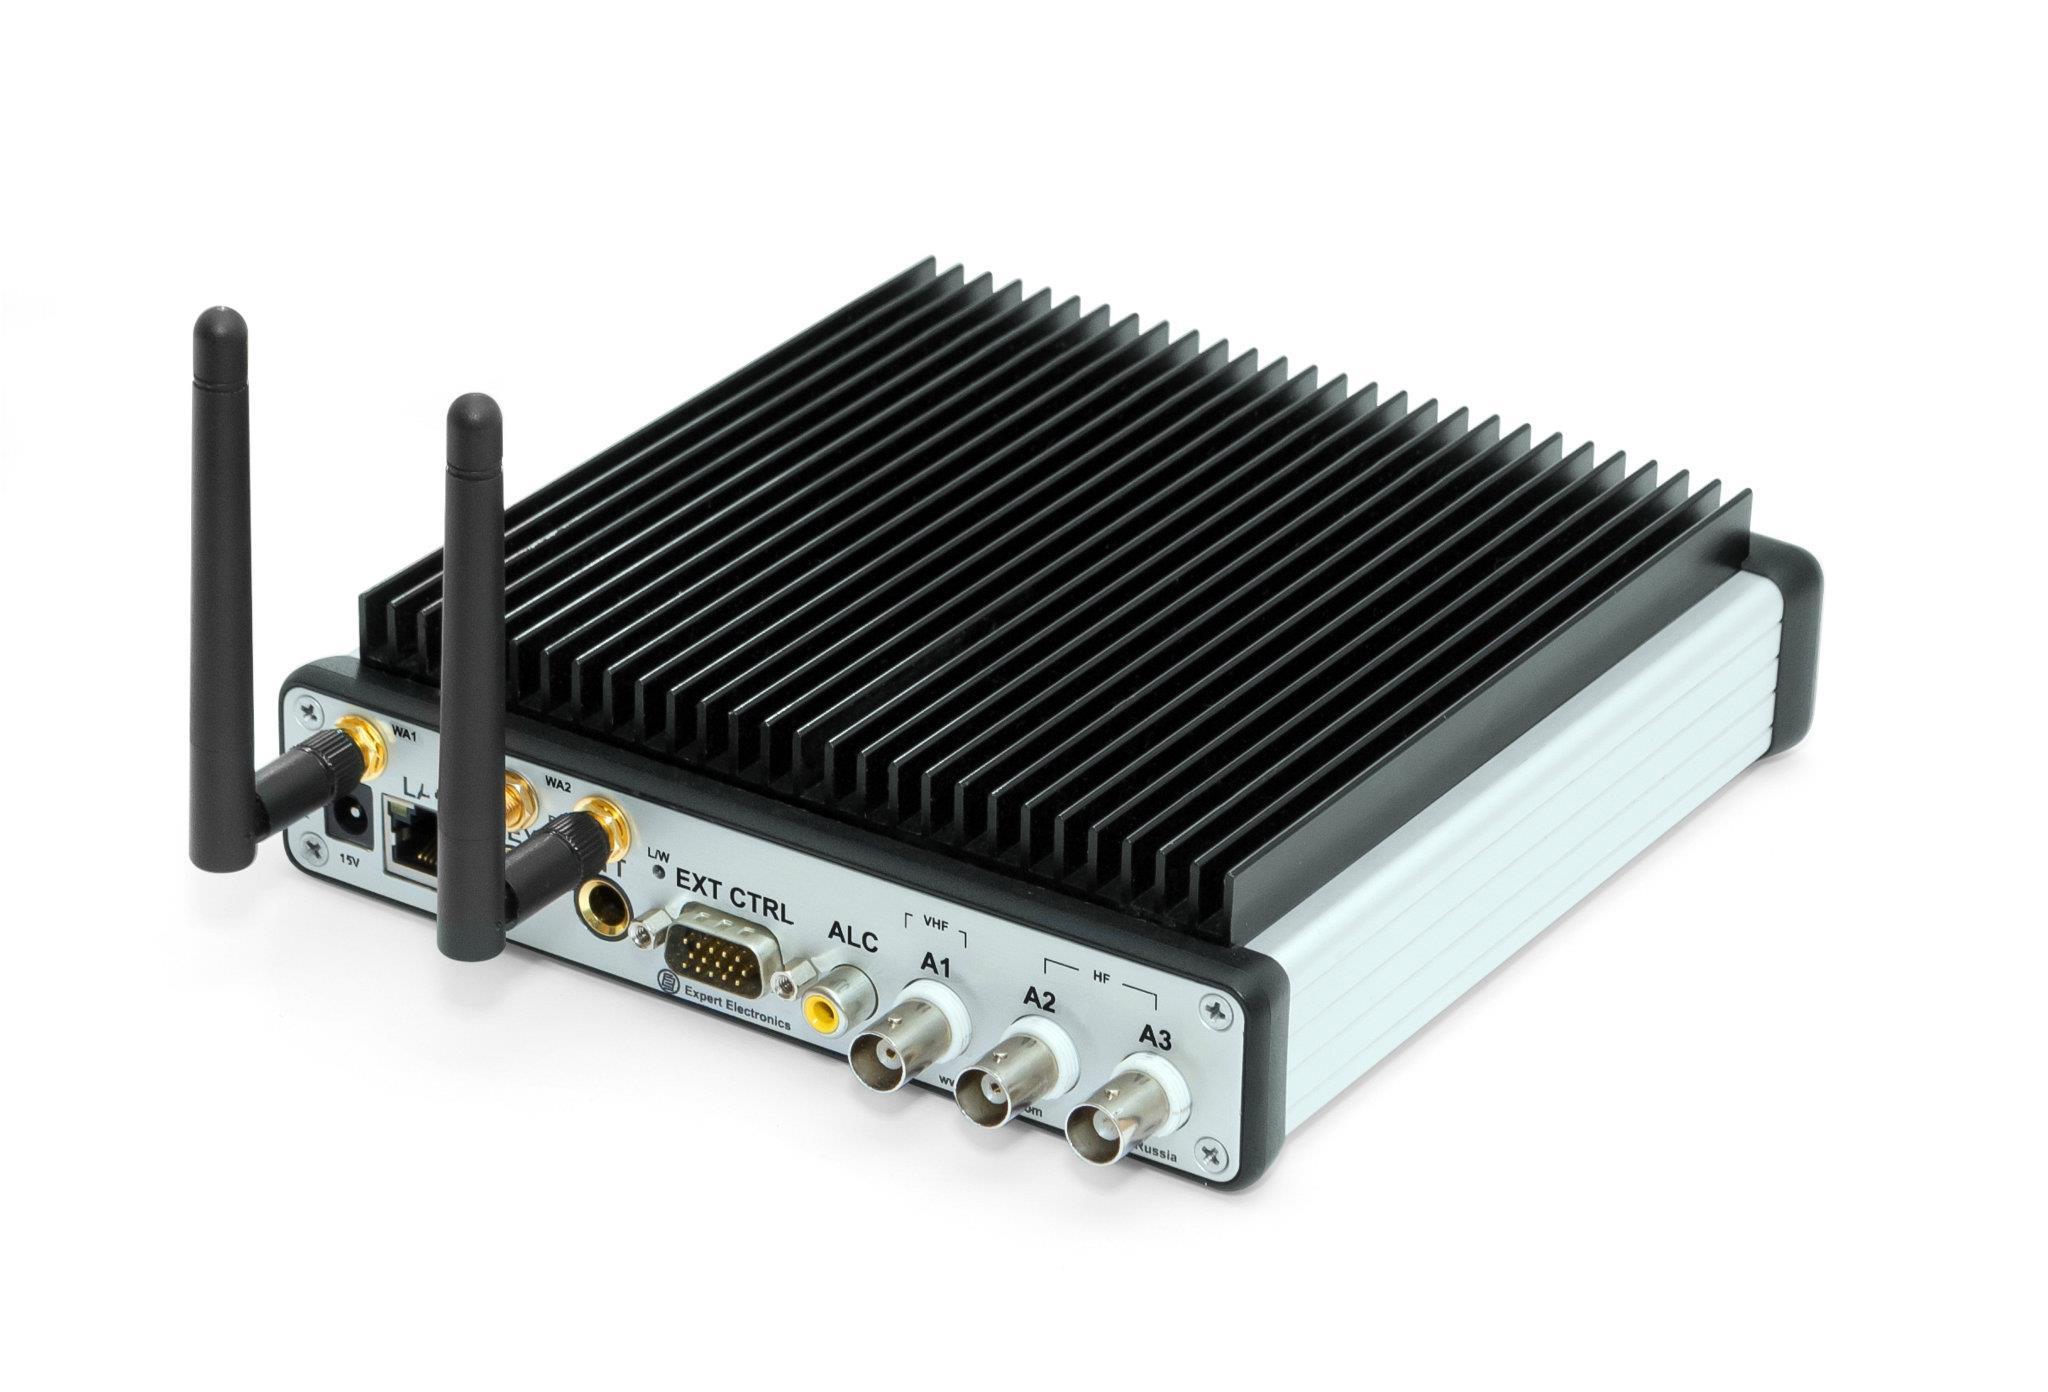 DUC/DDC SunSDR2 HF/VHF SDR Transceiver ‹ SPARKY's Blog